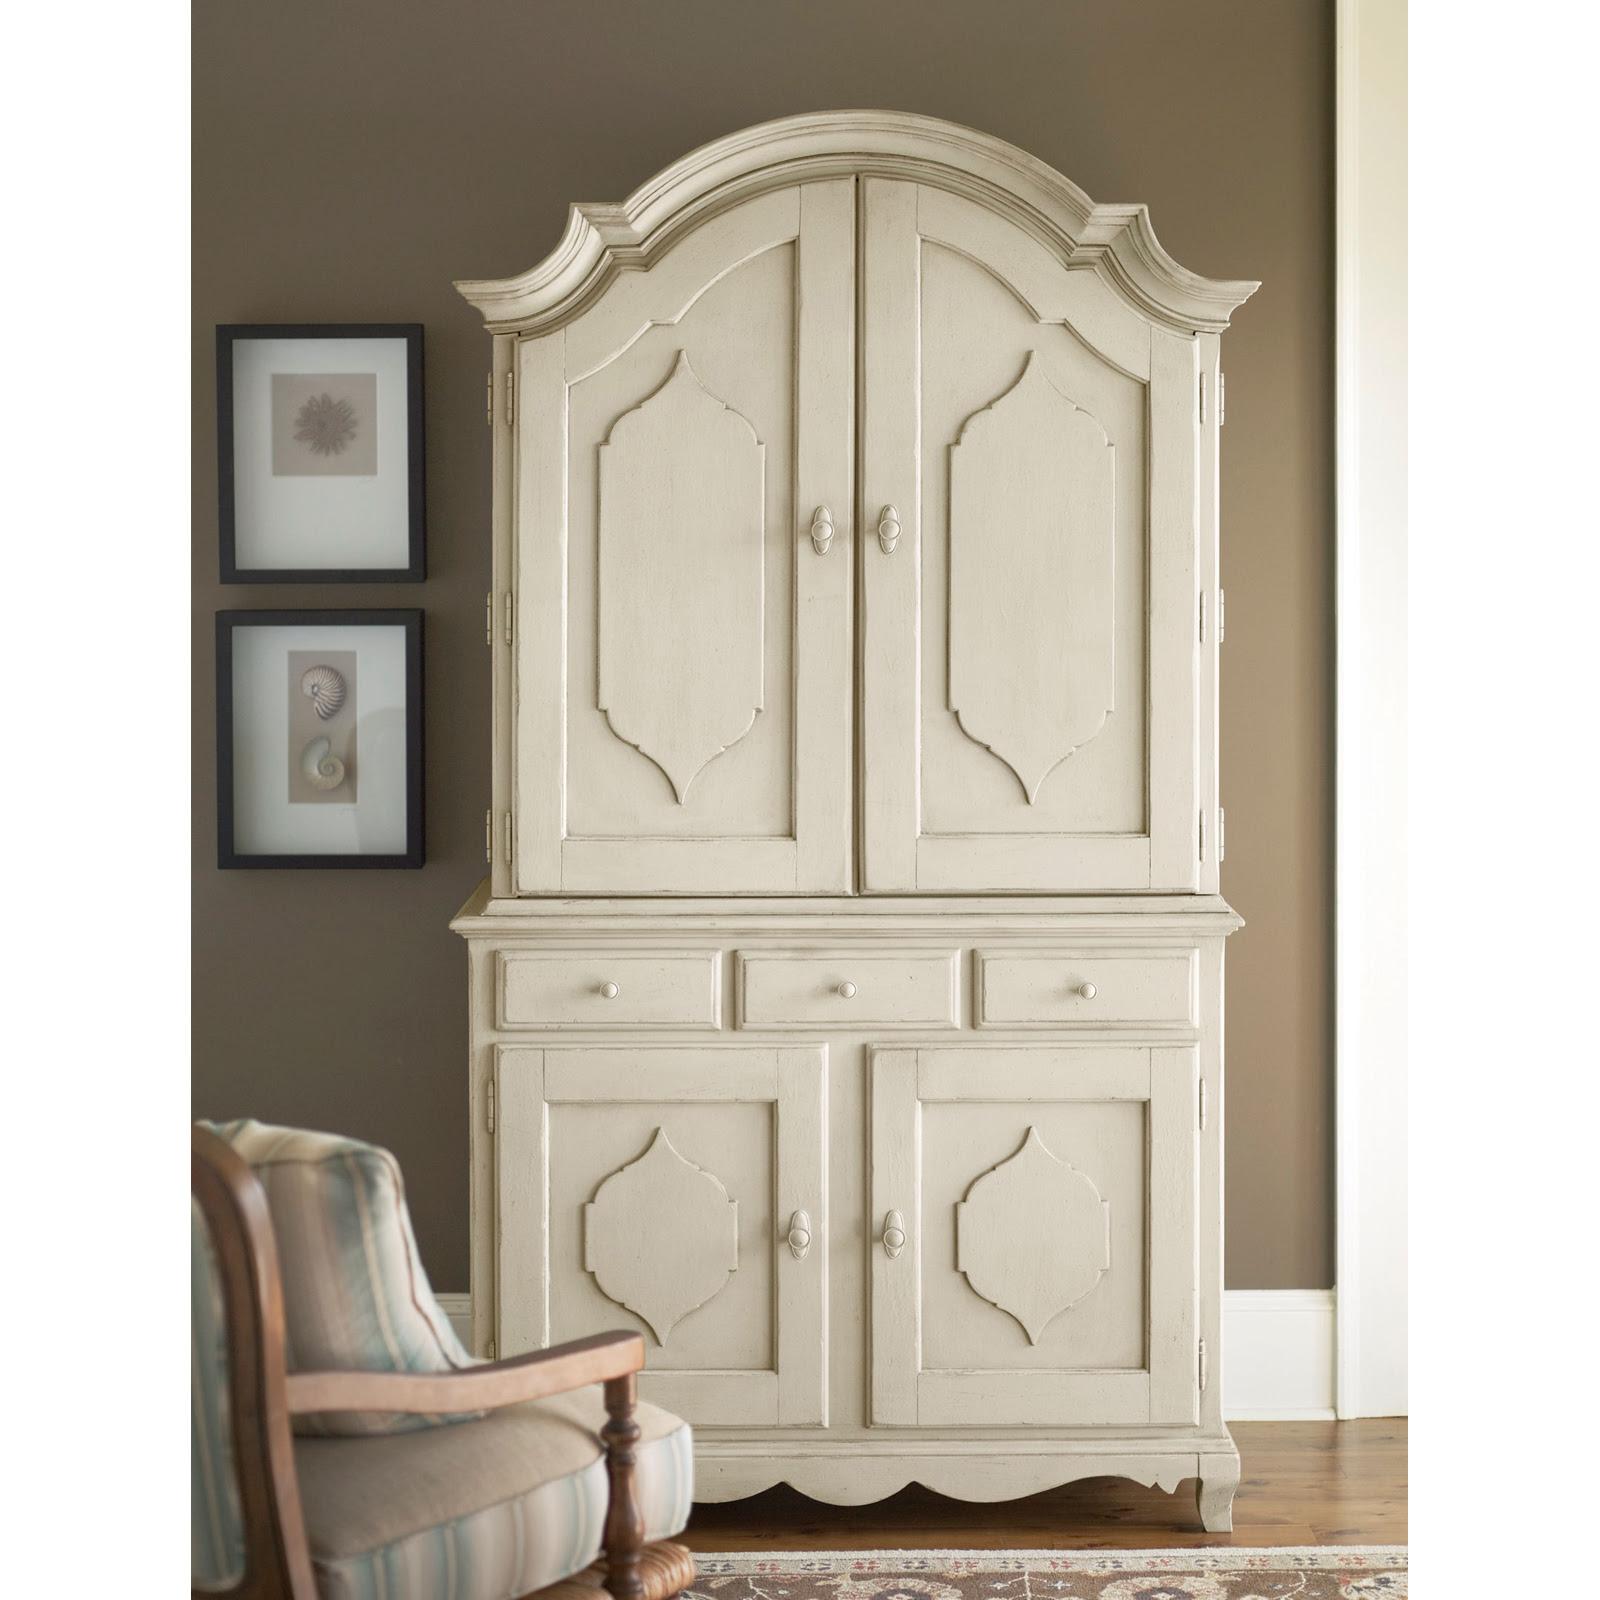 Paula Deen Down Home Complete Bar Cabinet - Linen at Hayneedle